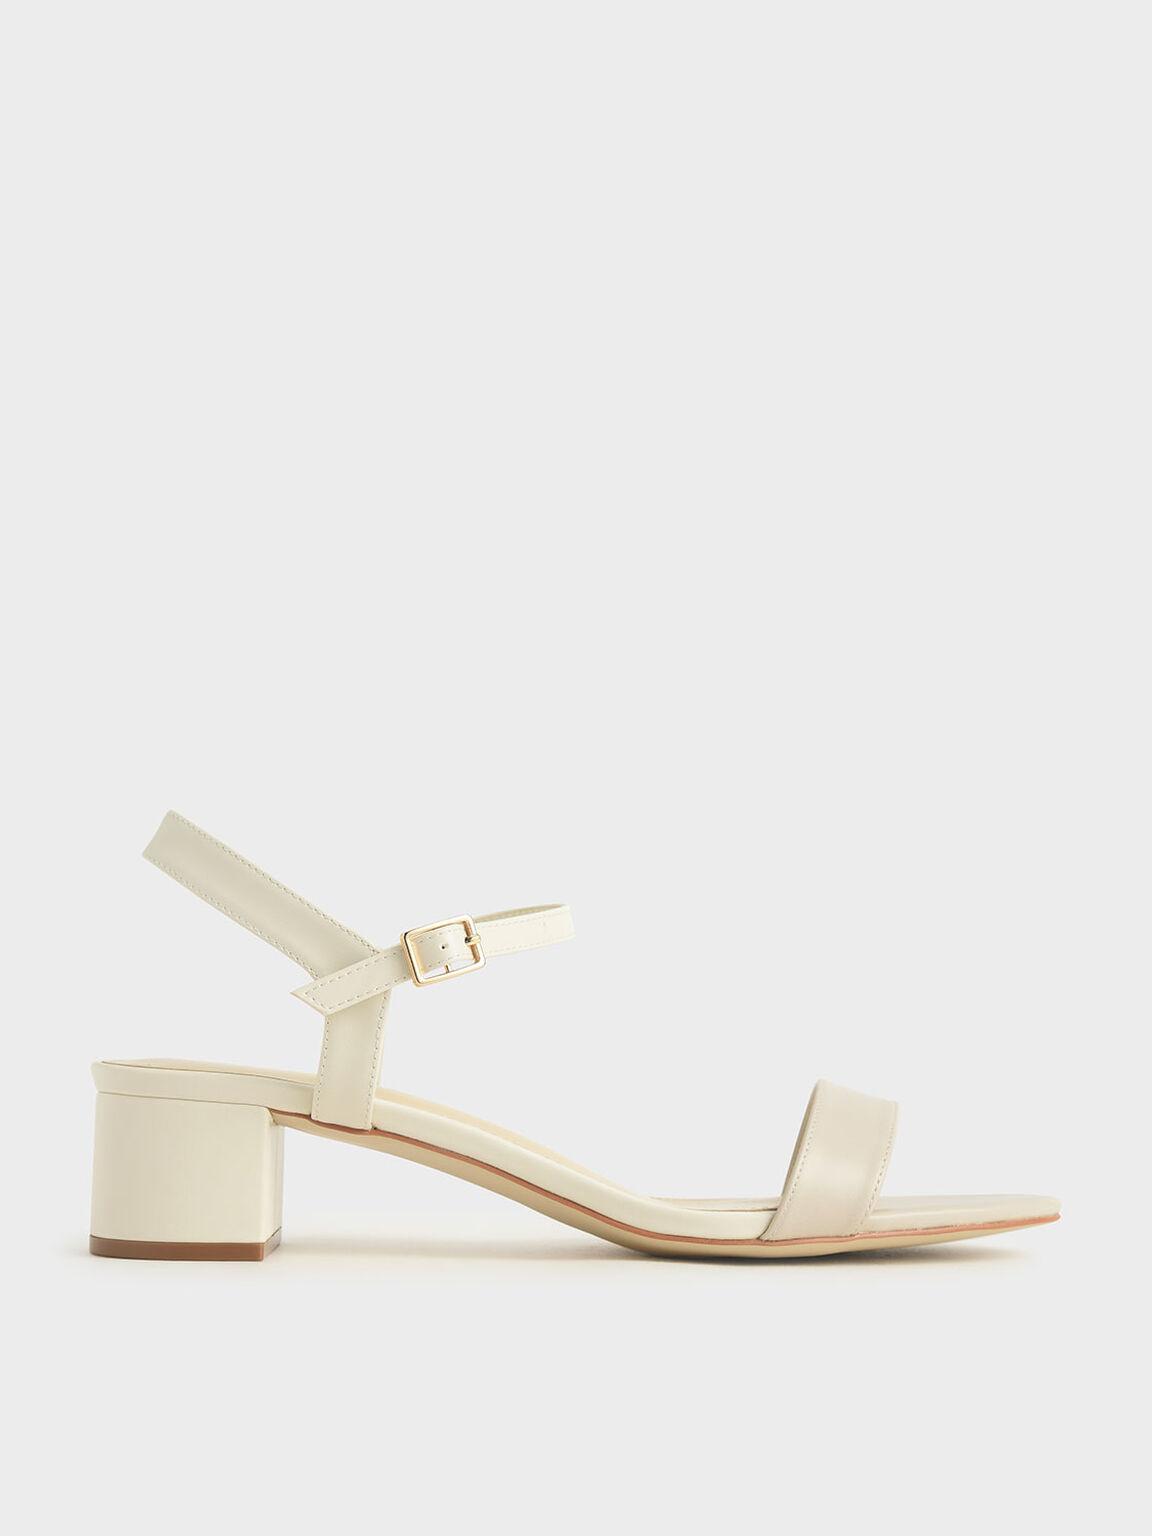 Sandal Open-Toe, Chalk, hi-res